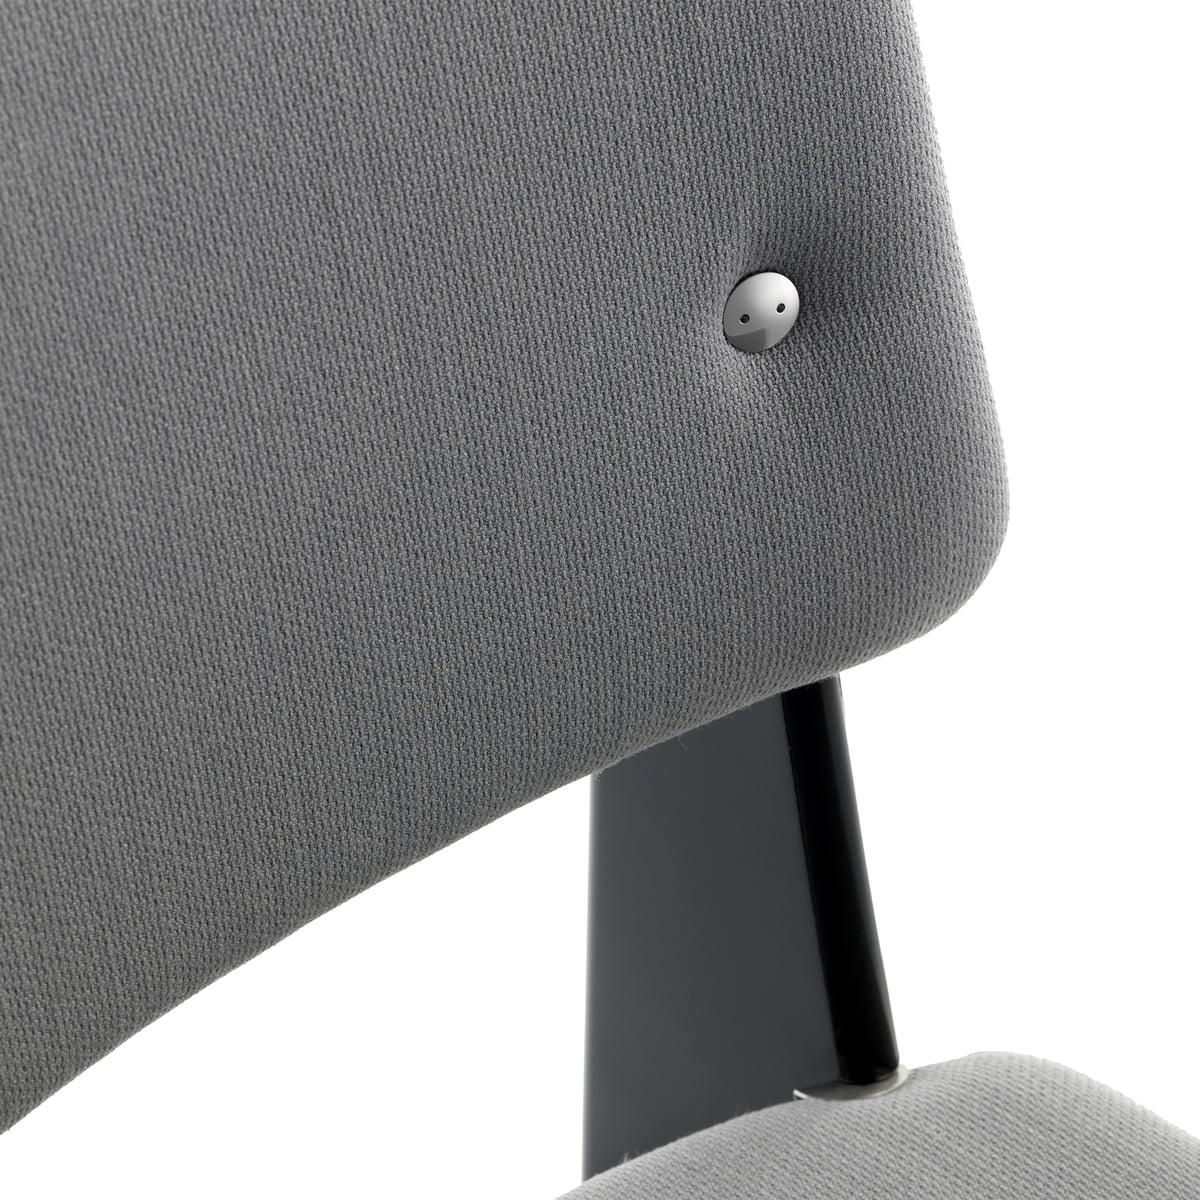 Jean Prouvéu0027s Standard SR Chair By Vitra